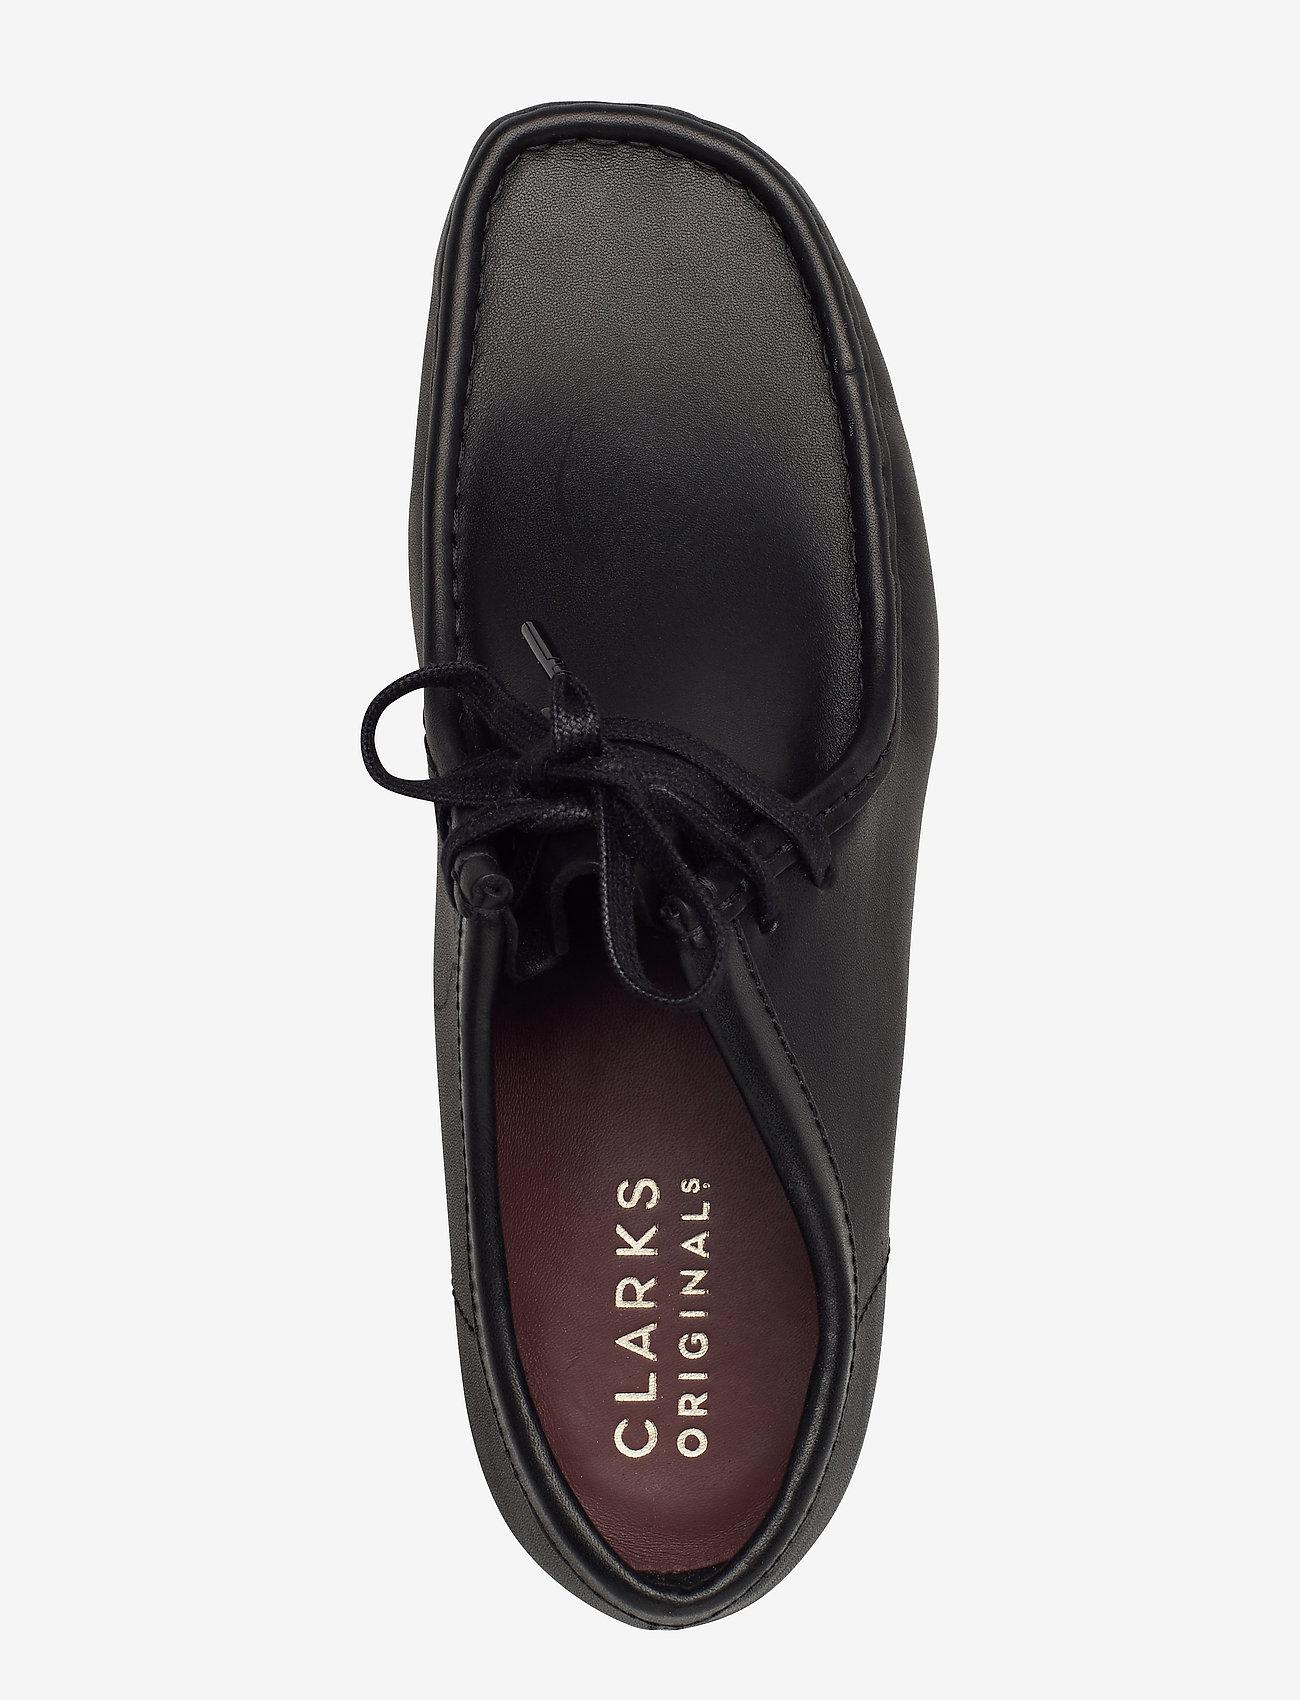 Clarks Originals - Wallabee - snörskor - black leather - 3